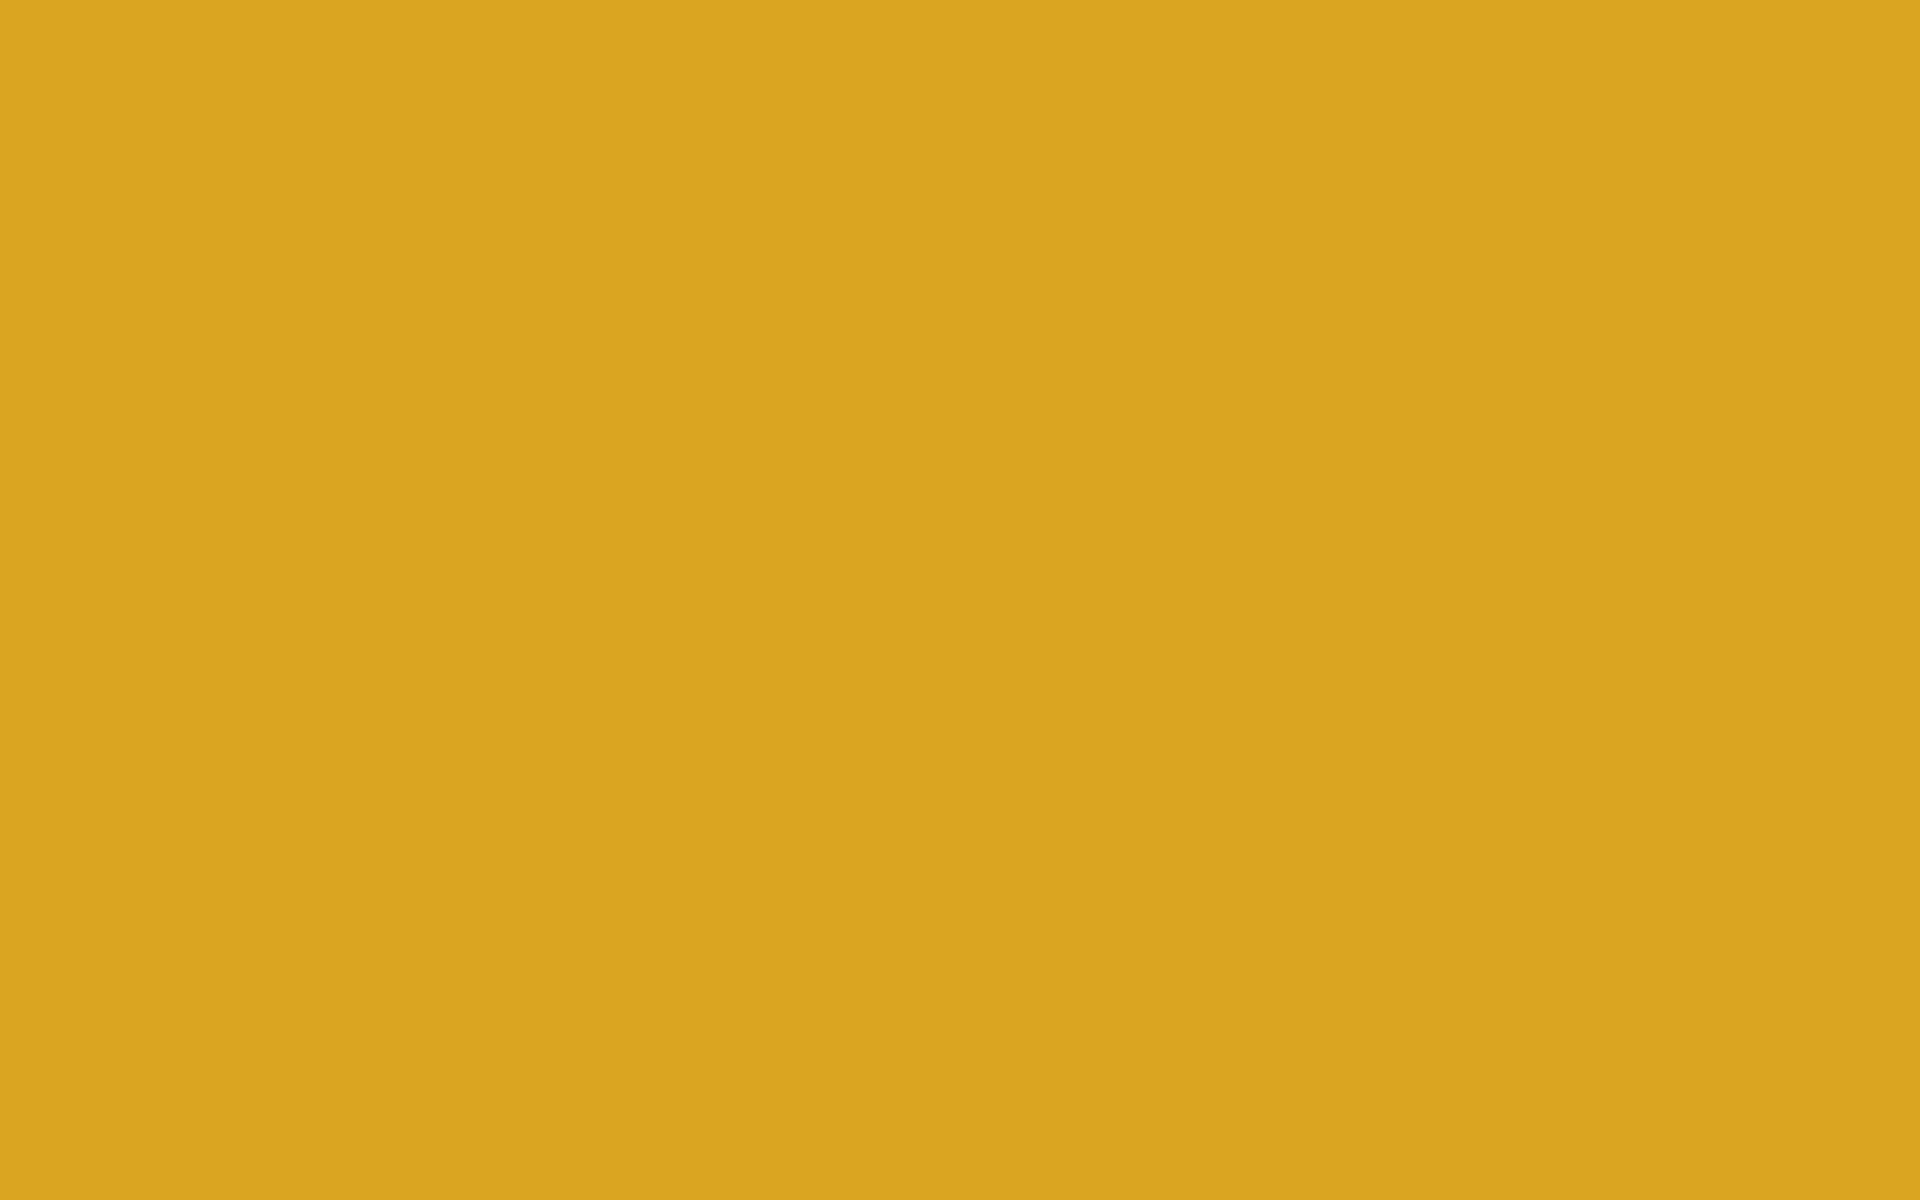 1920x1200 Goldenrod Solid Color Background